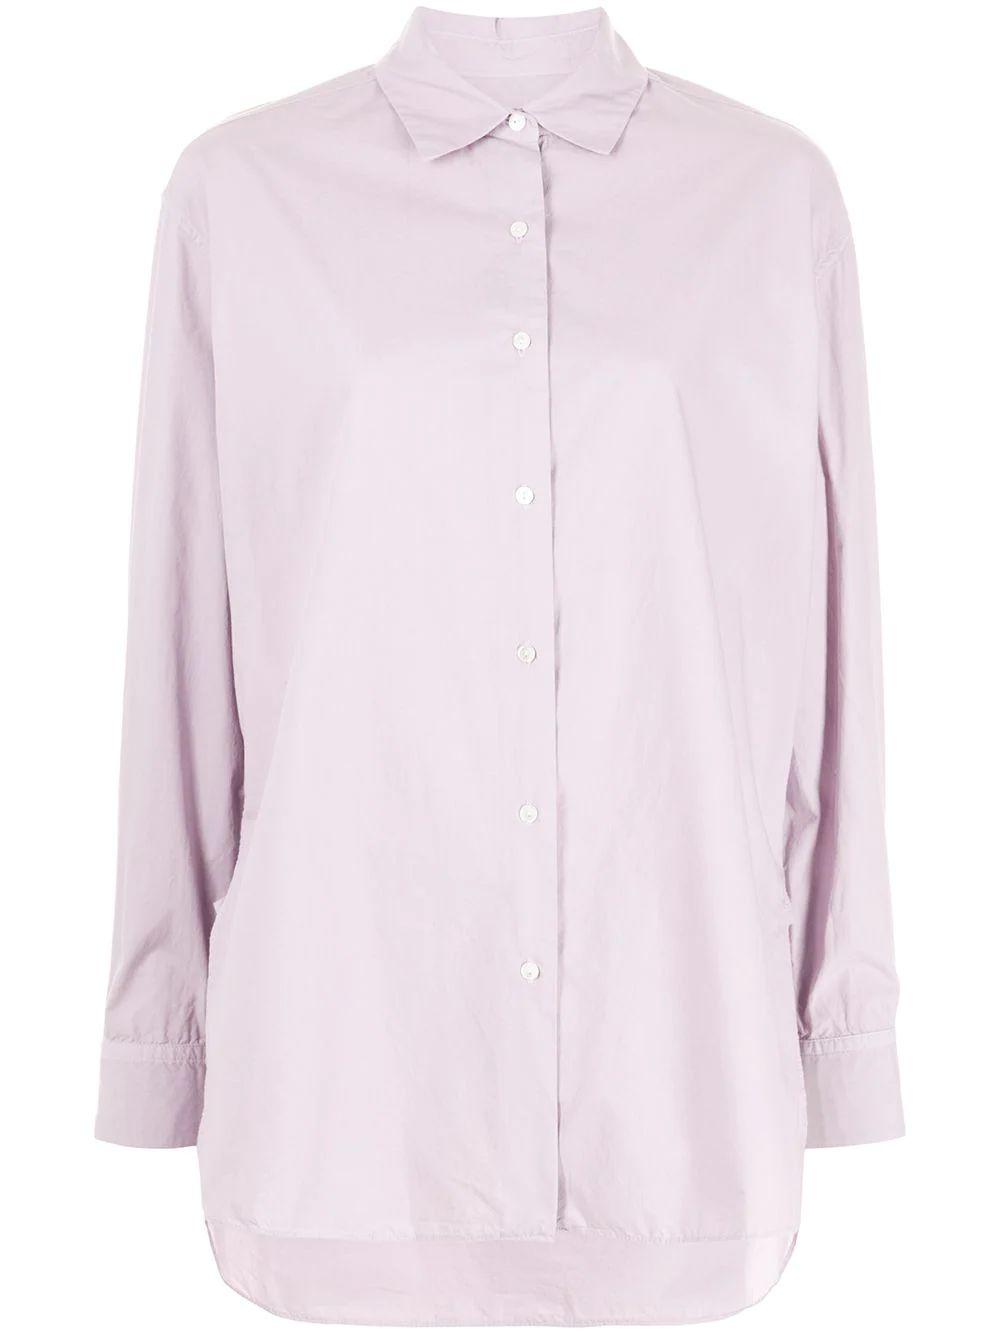 Yorke Oversized Button Up Shirt Item # 00236-W154